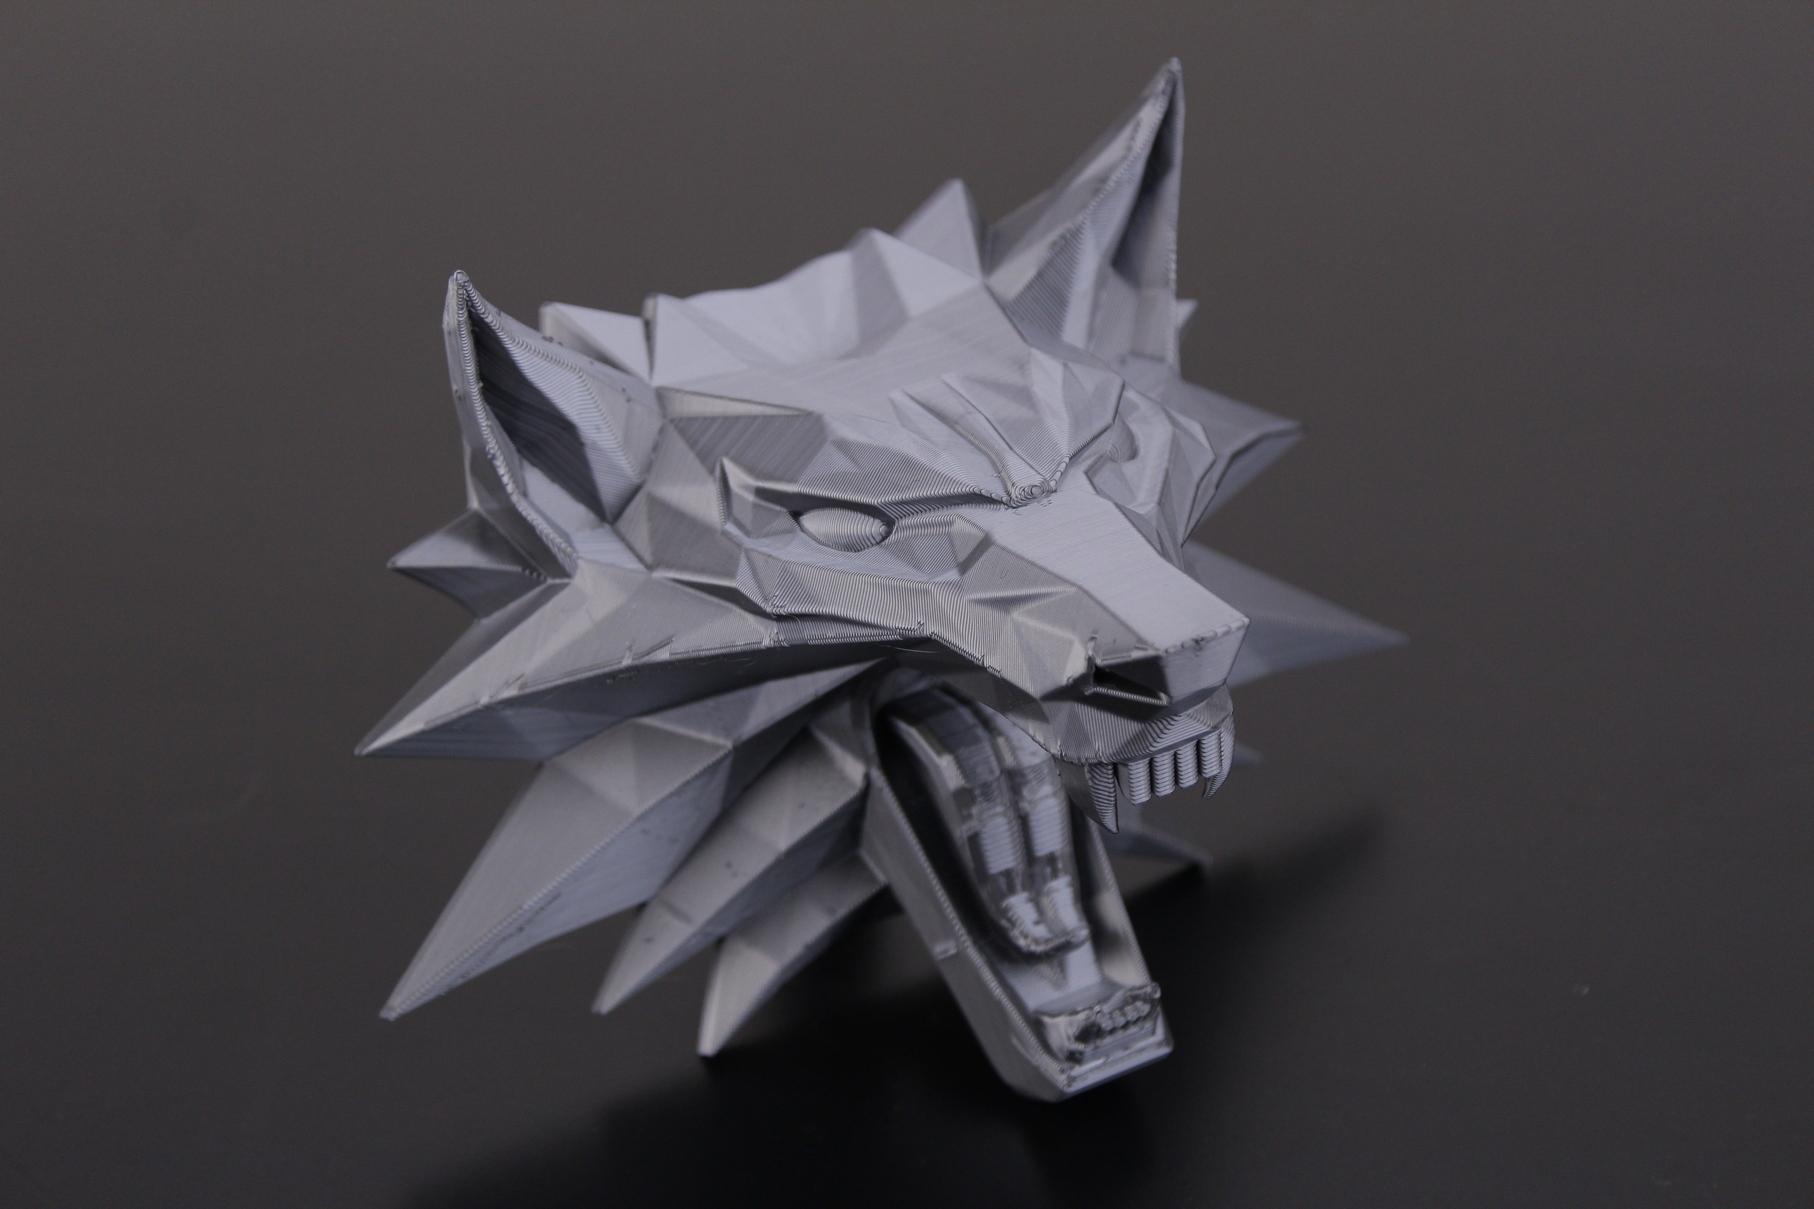 Witcher Wolf Medallion 1 | Trianglelab Spiral Tower Hotend Review